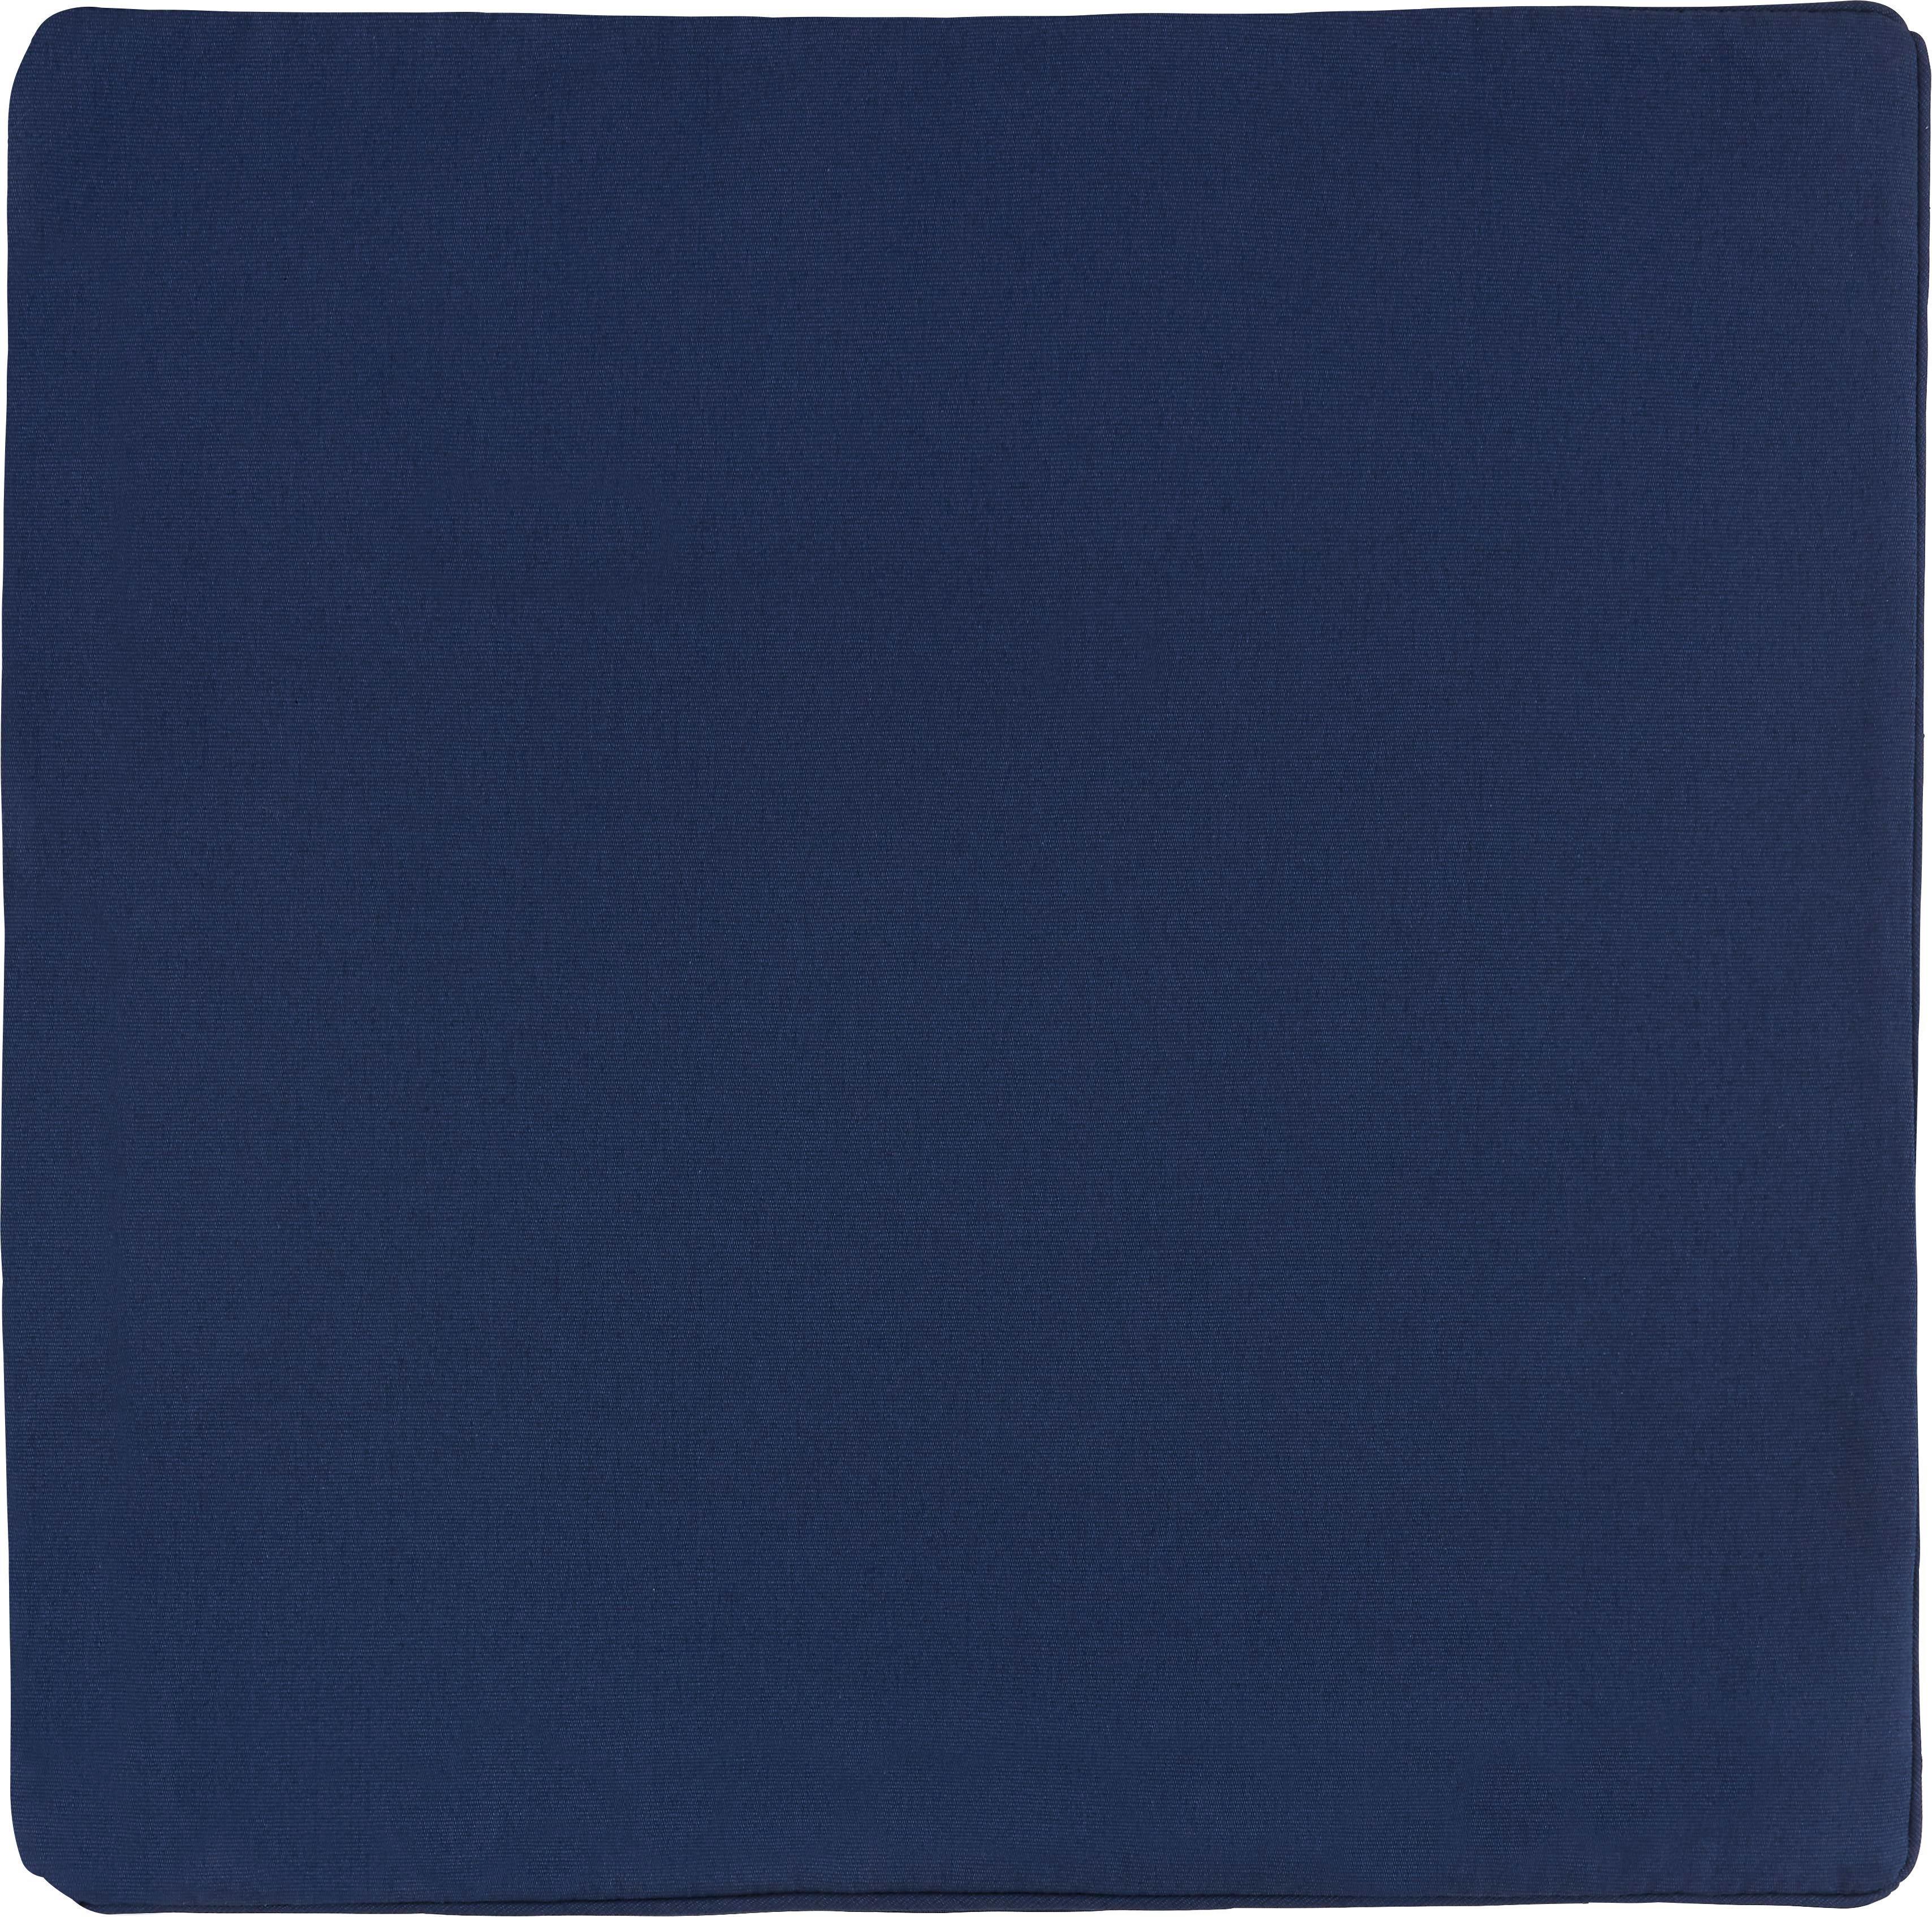 Povlak Na Polštář Steffi Paspel - tmavě modrá, textil (50/50cm) - MÖMAX modern living